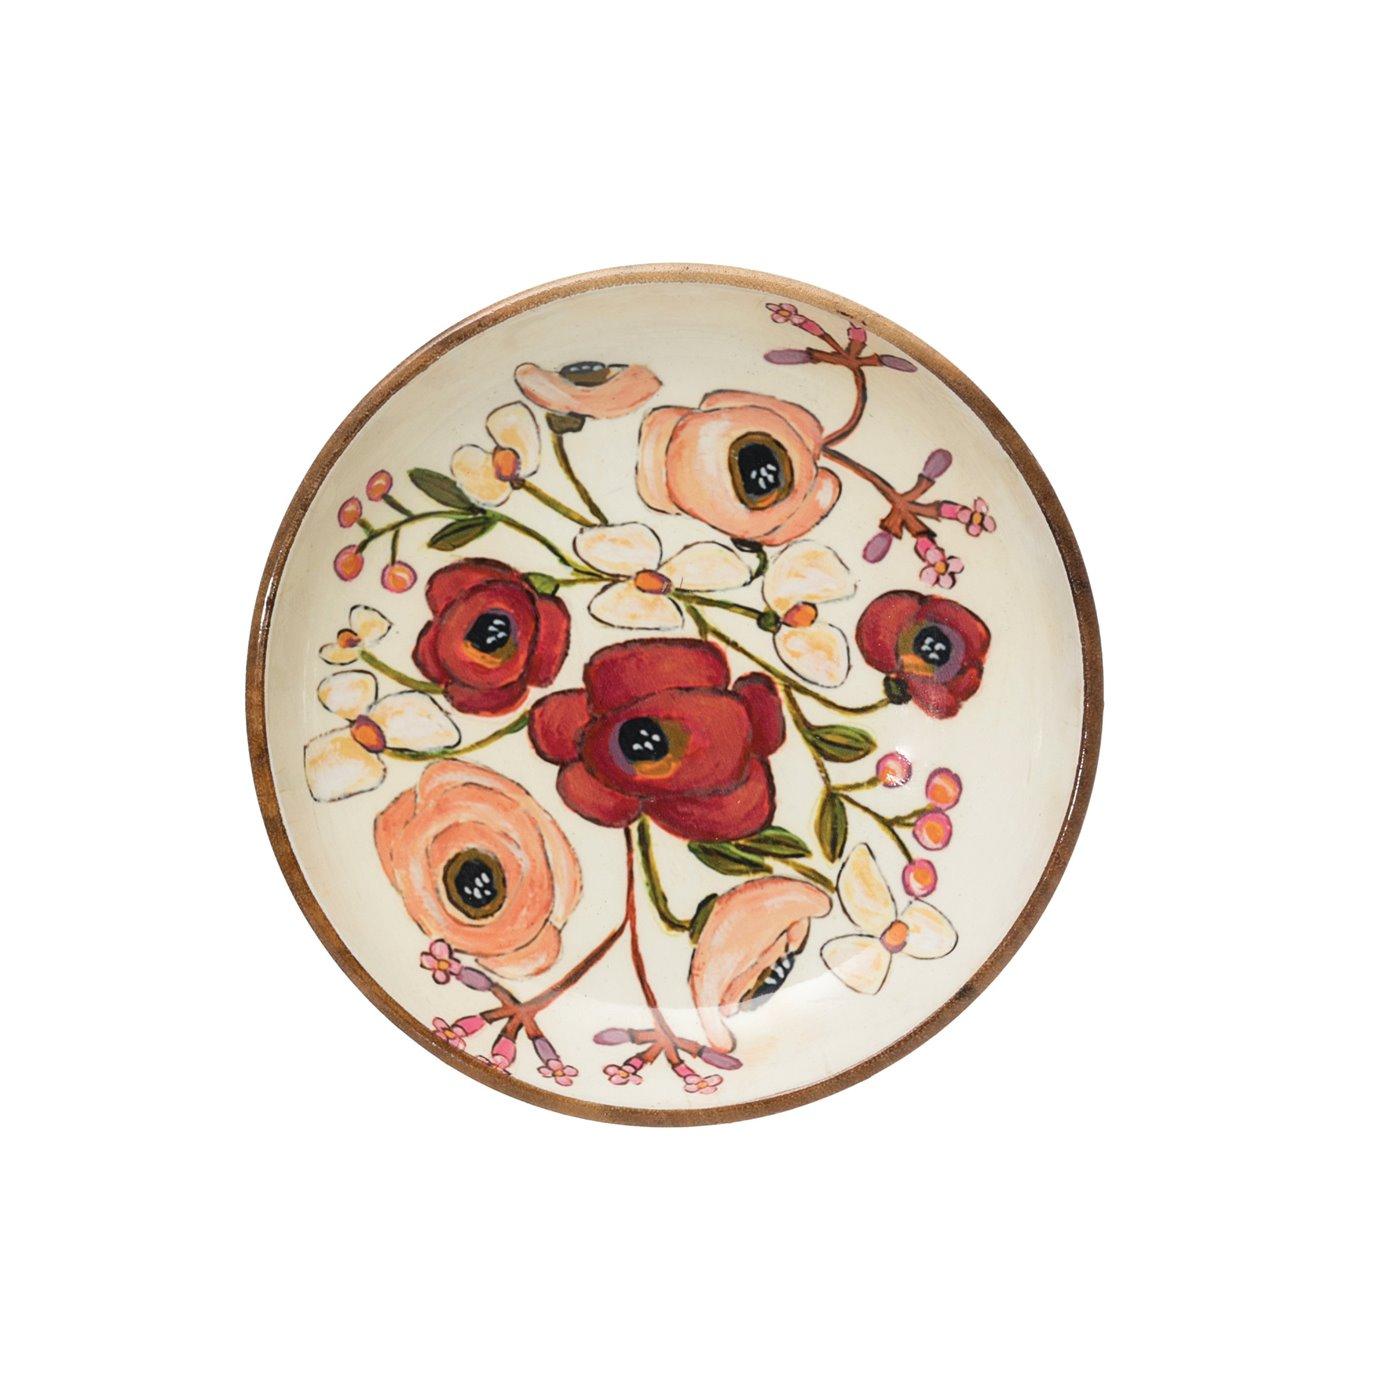 Enameled Acacia Wood Bowl with Flowers